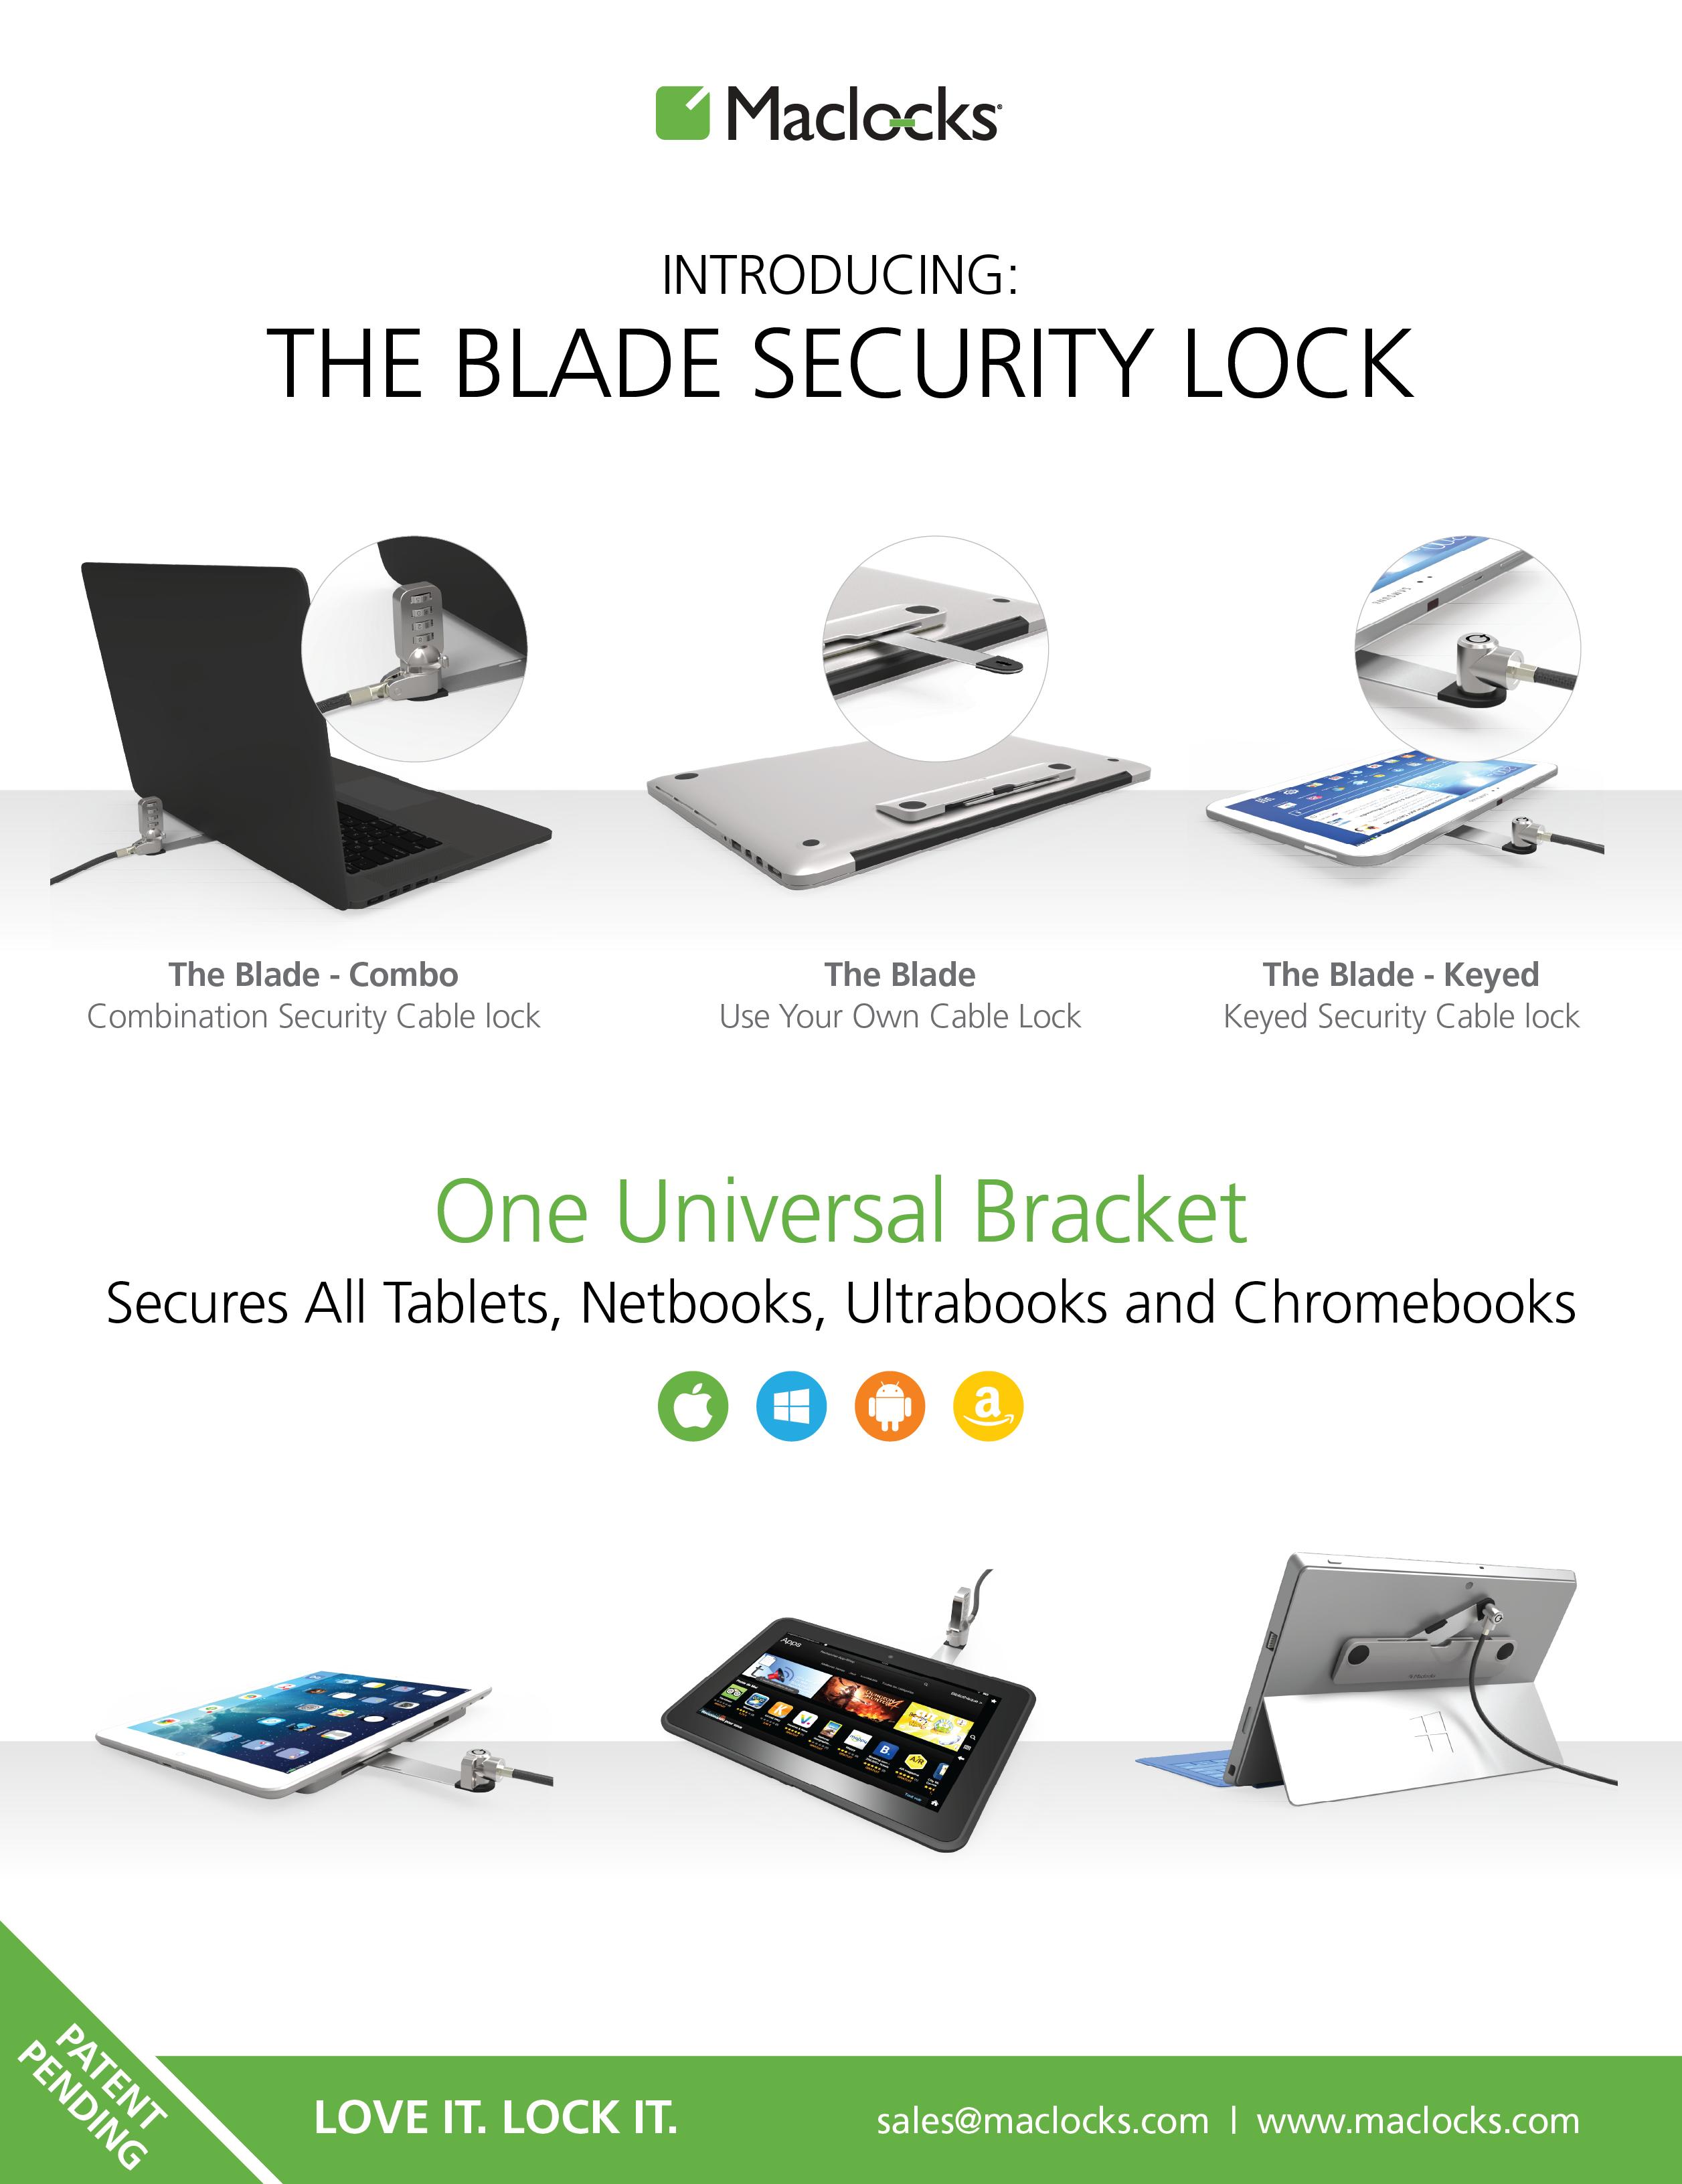 maclocks, mac lock, lock, locks, mac, ipad, tablet, tablets, ipads, apple, samsung, galaxy, kindle, surface, laptop, latops, macbook, macbooks, macbookair, ipad air, ipadair2, blade, the blade, locking bracket, security lock, security, universal